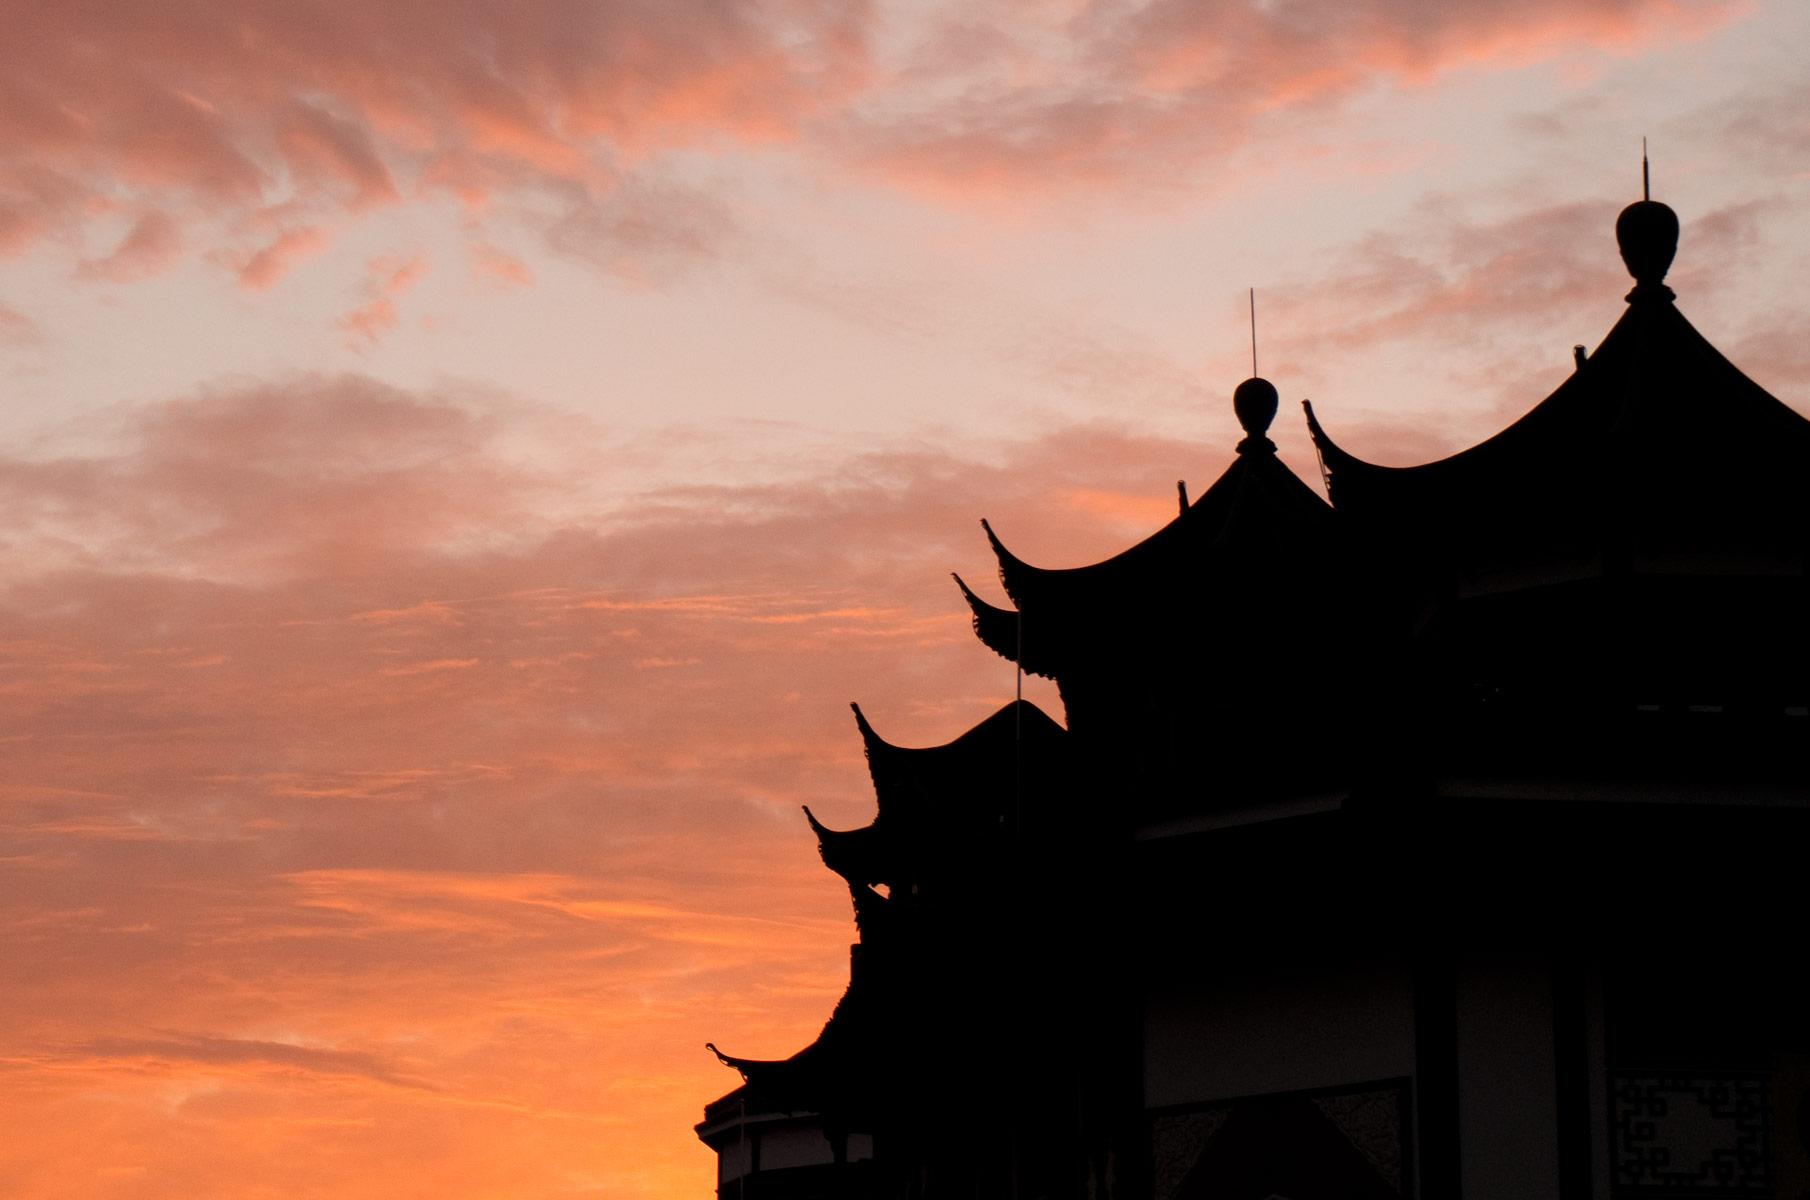 Roter Sonnenuntergang Himmel über Shanghai, China